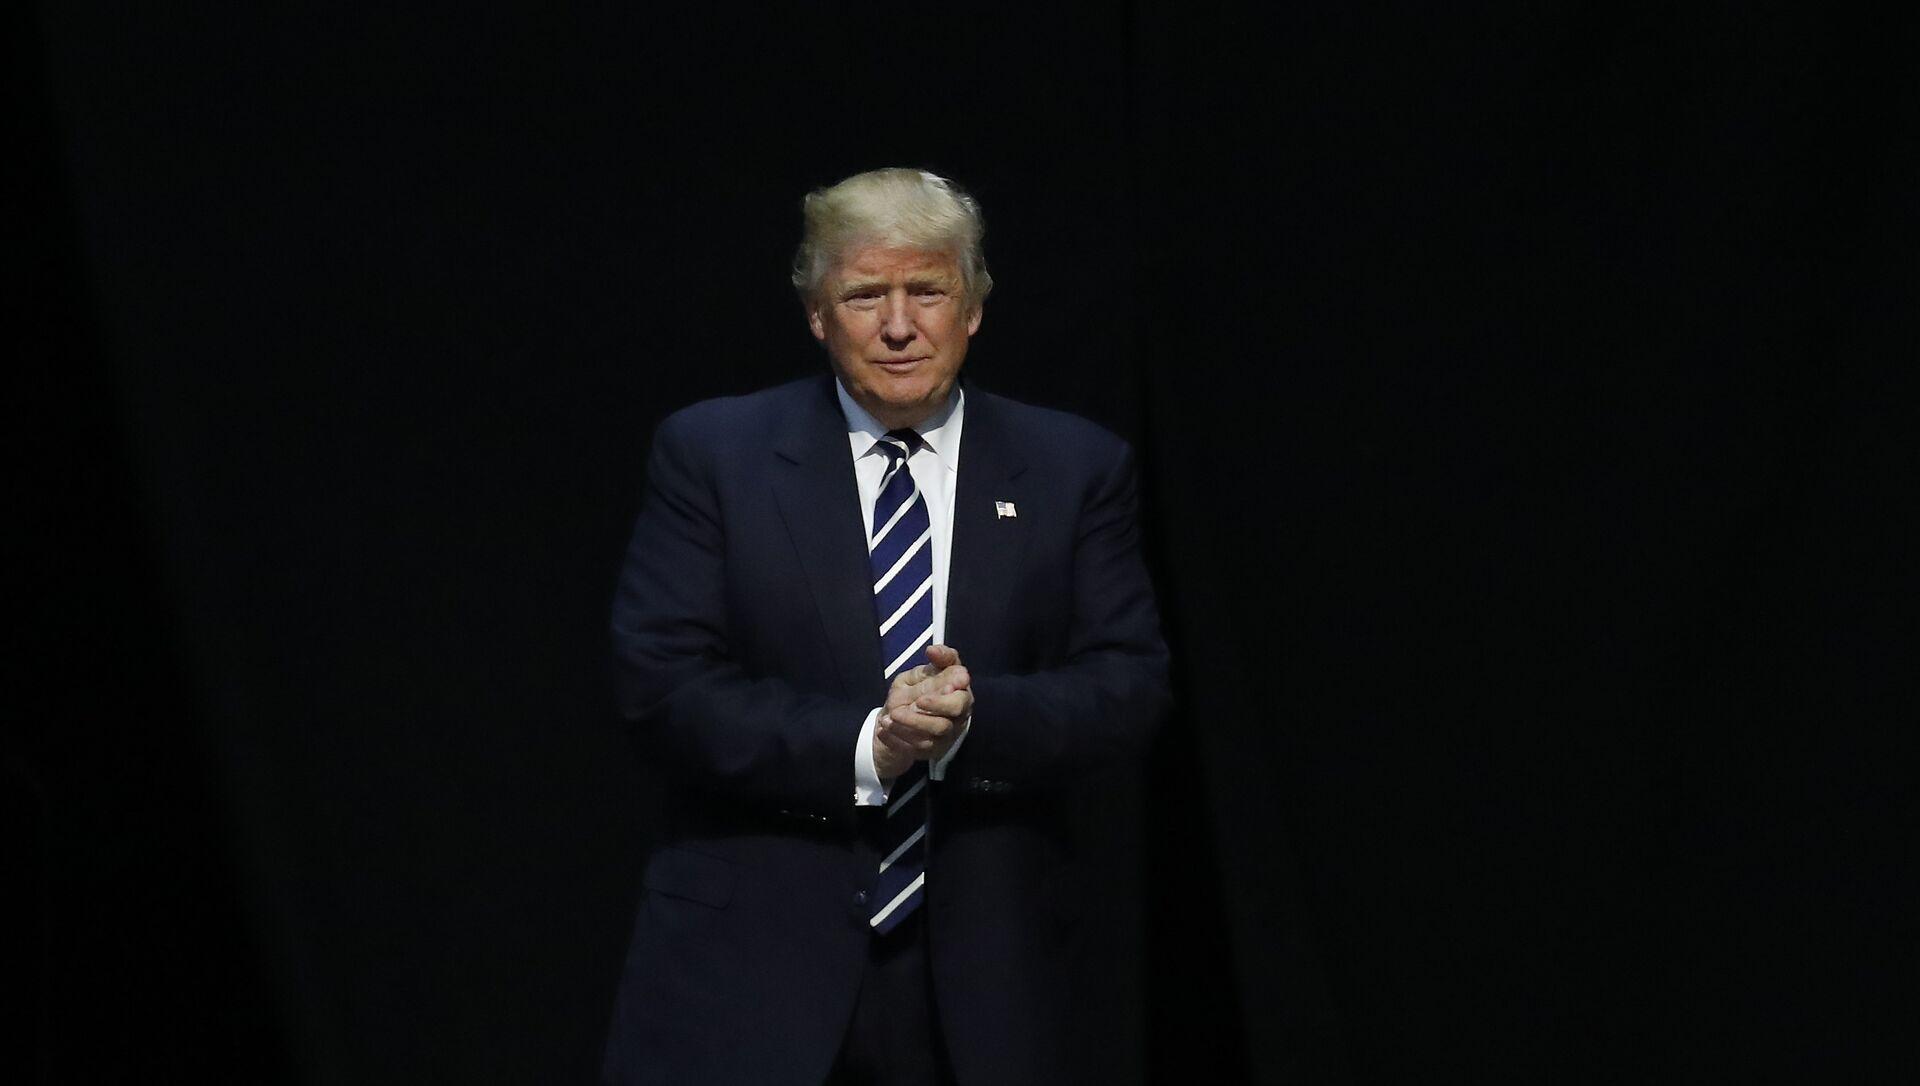 Donald Trump, presidente electo de EEUU - Sputnik Mundo, 1920, 04.02.2021